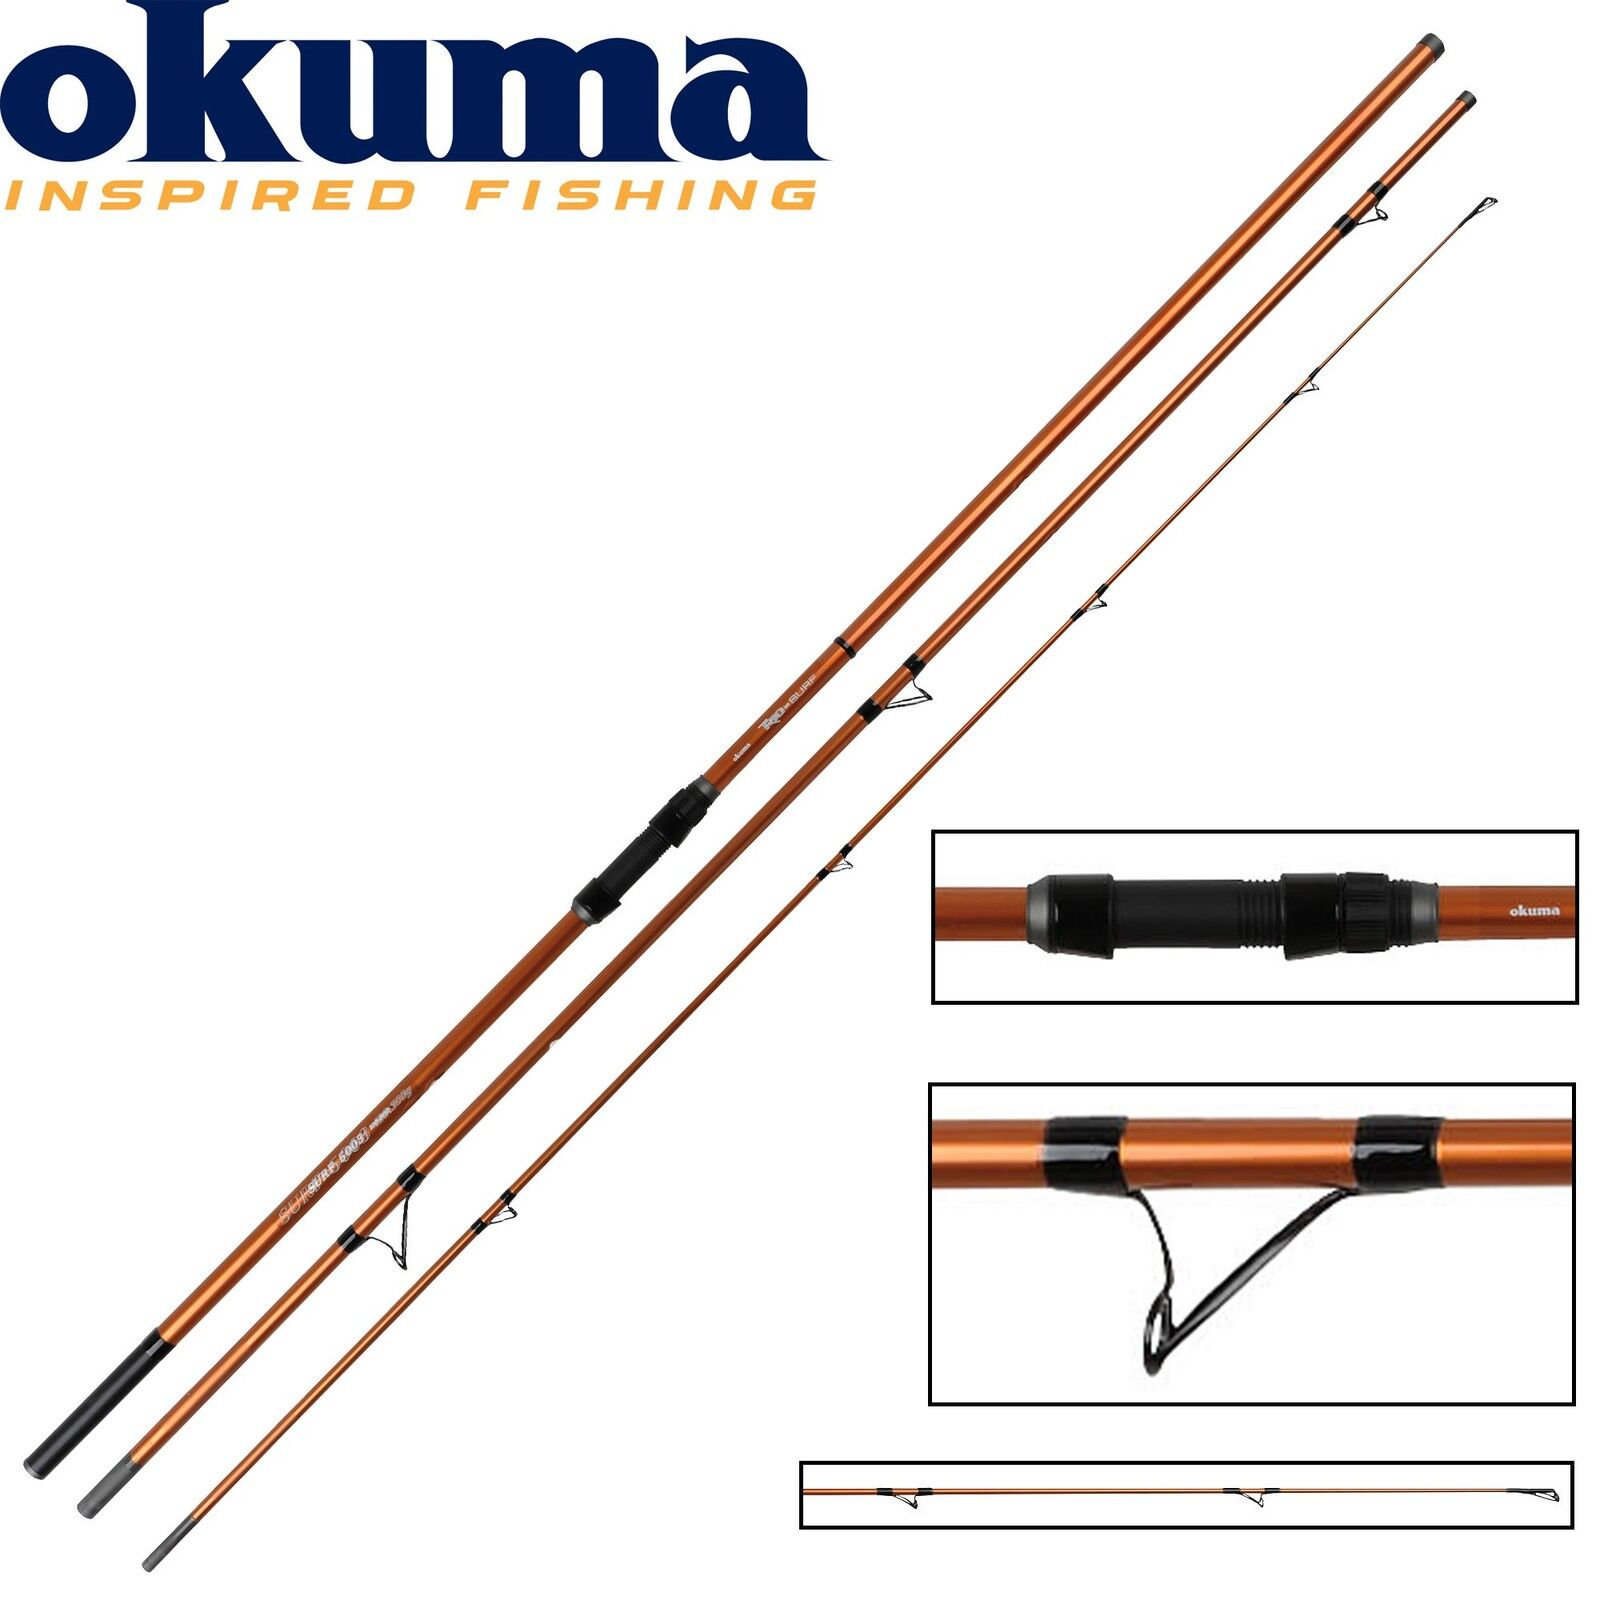 Okuma Trio Rex Surf 450cm 100-200g Brandungsrute, Angelrute zum Meeresangeln